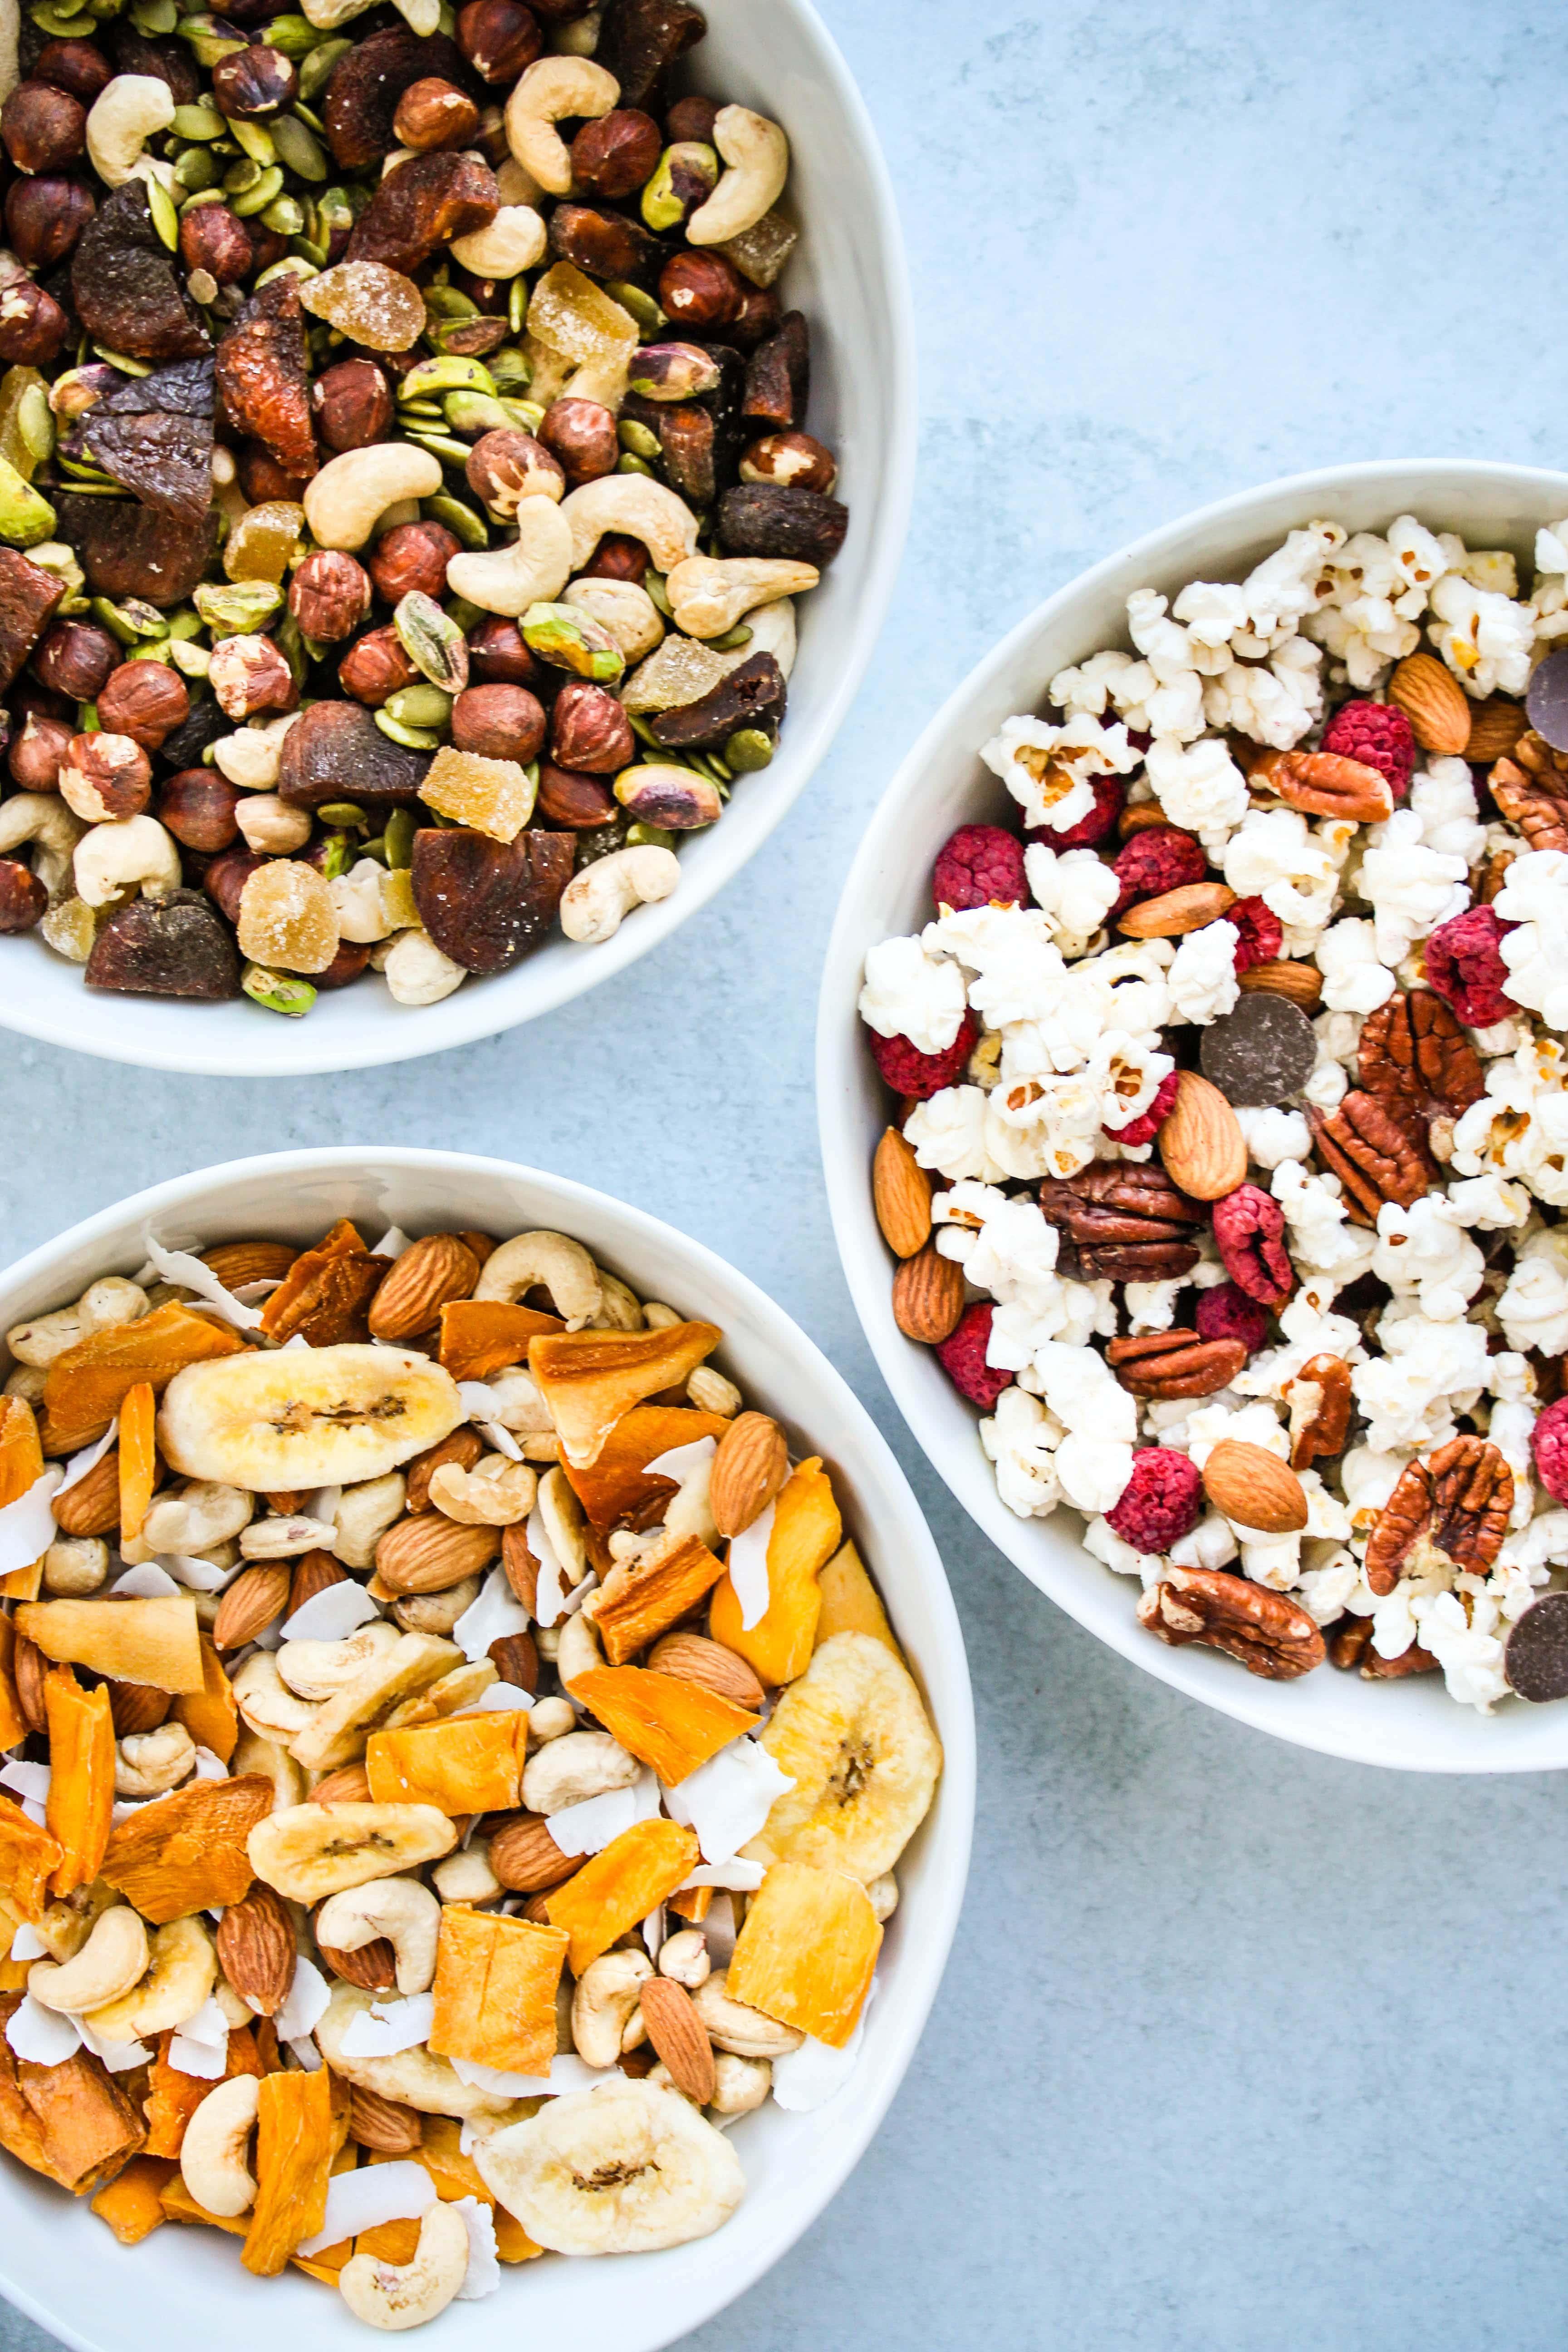 Healthy Homemade Trail Mix 3 Ways